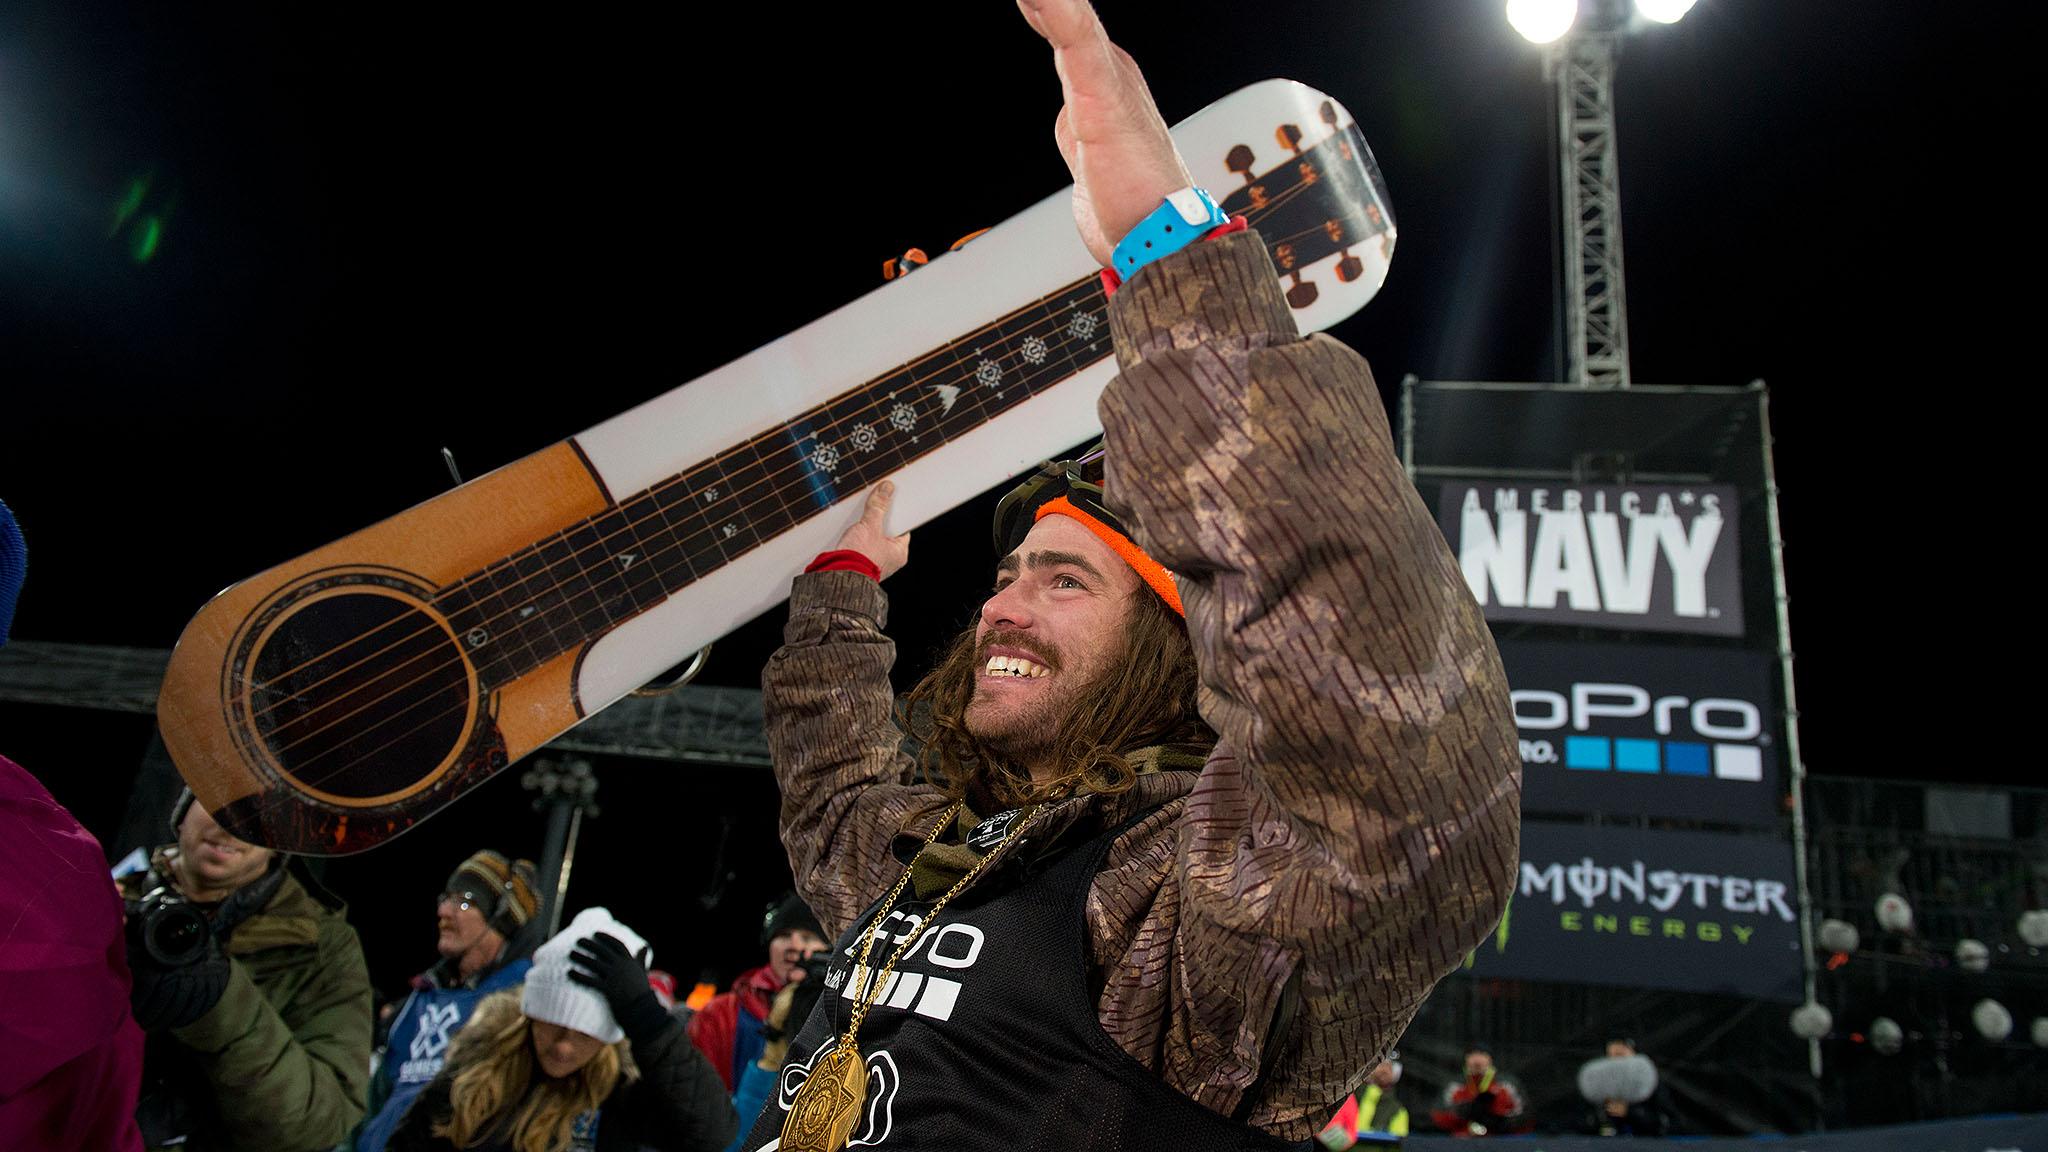 Danny Davis, Snowboard SuperPipe